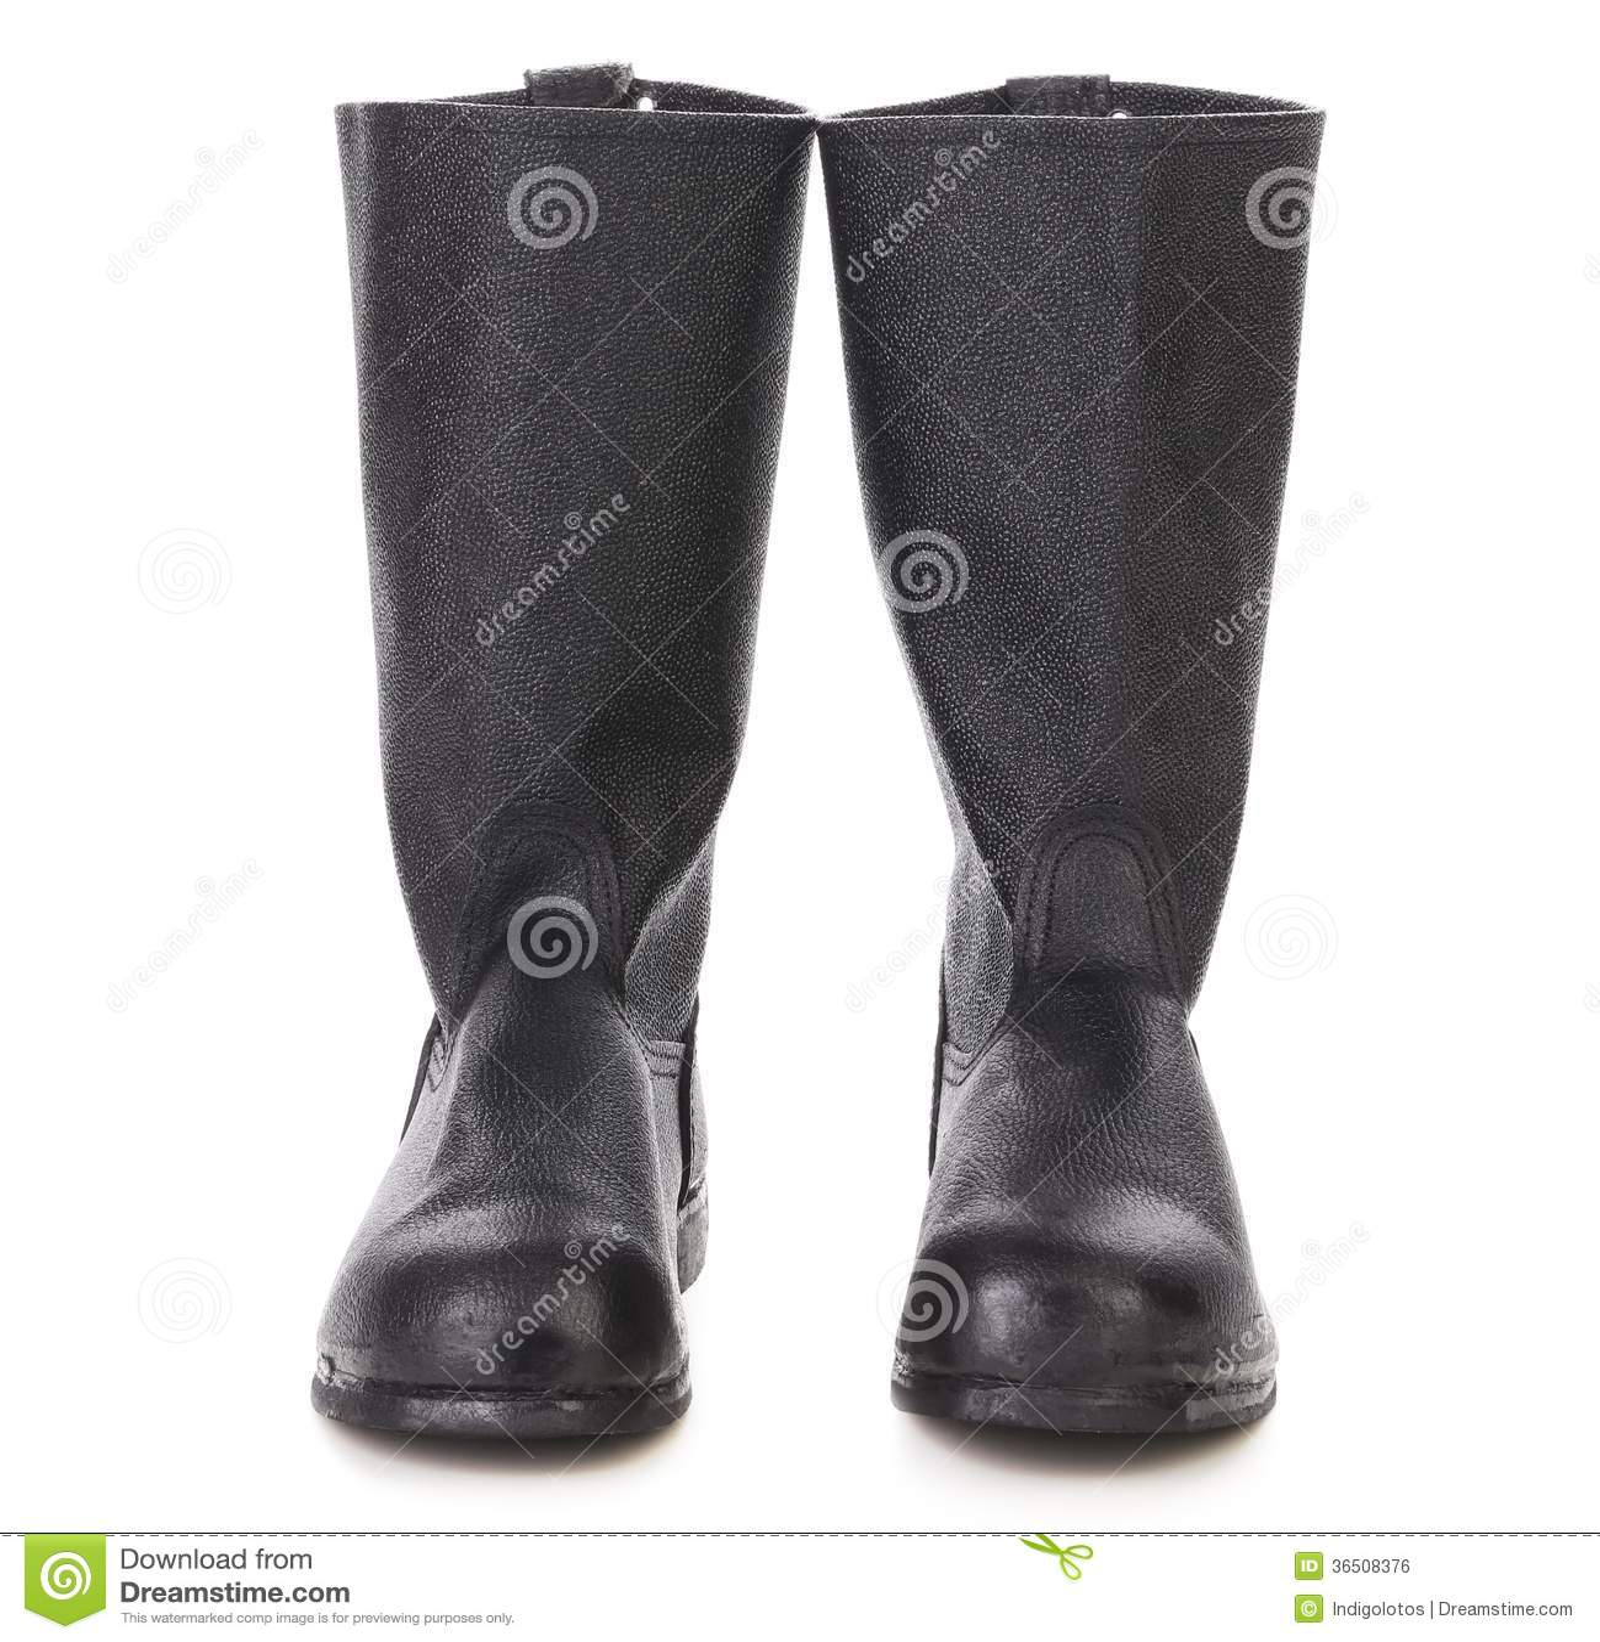 Cor preta das botas altas.